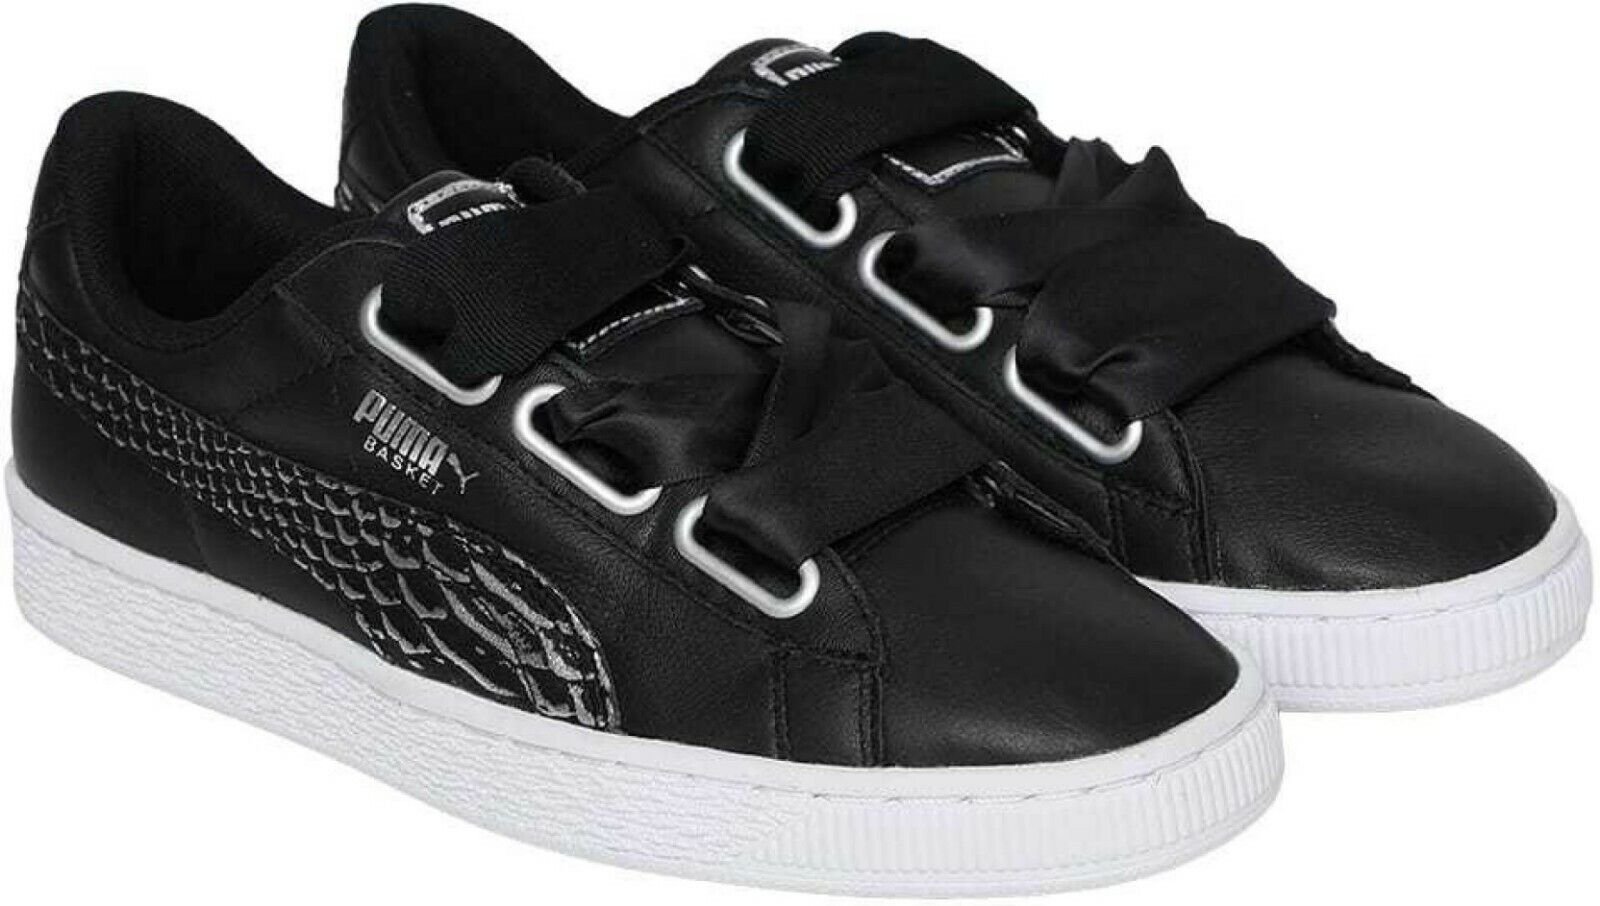 PUMA Wouomo Basket Heart Oceanaire Wn scarpe da ginnastica Dimensione 6